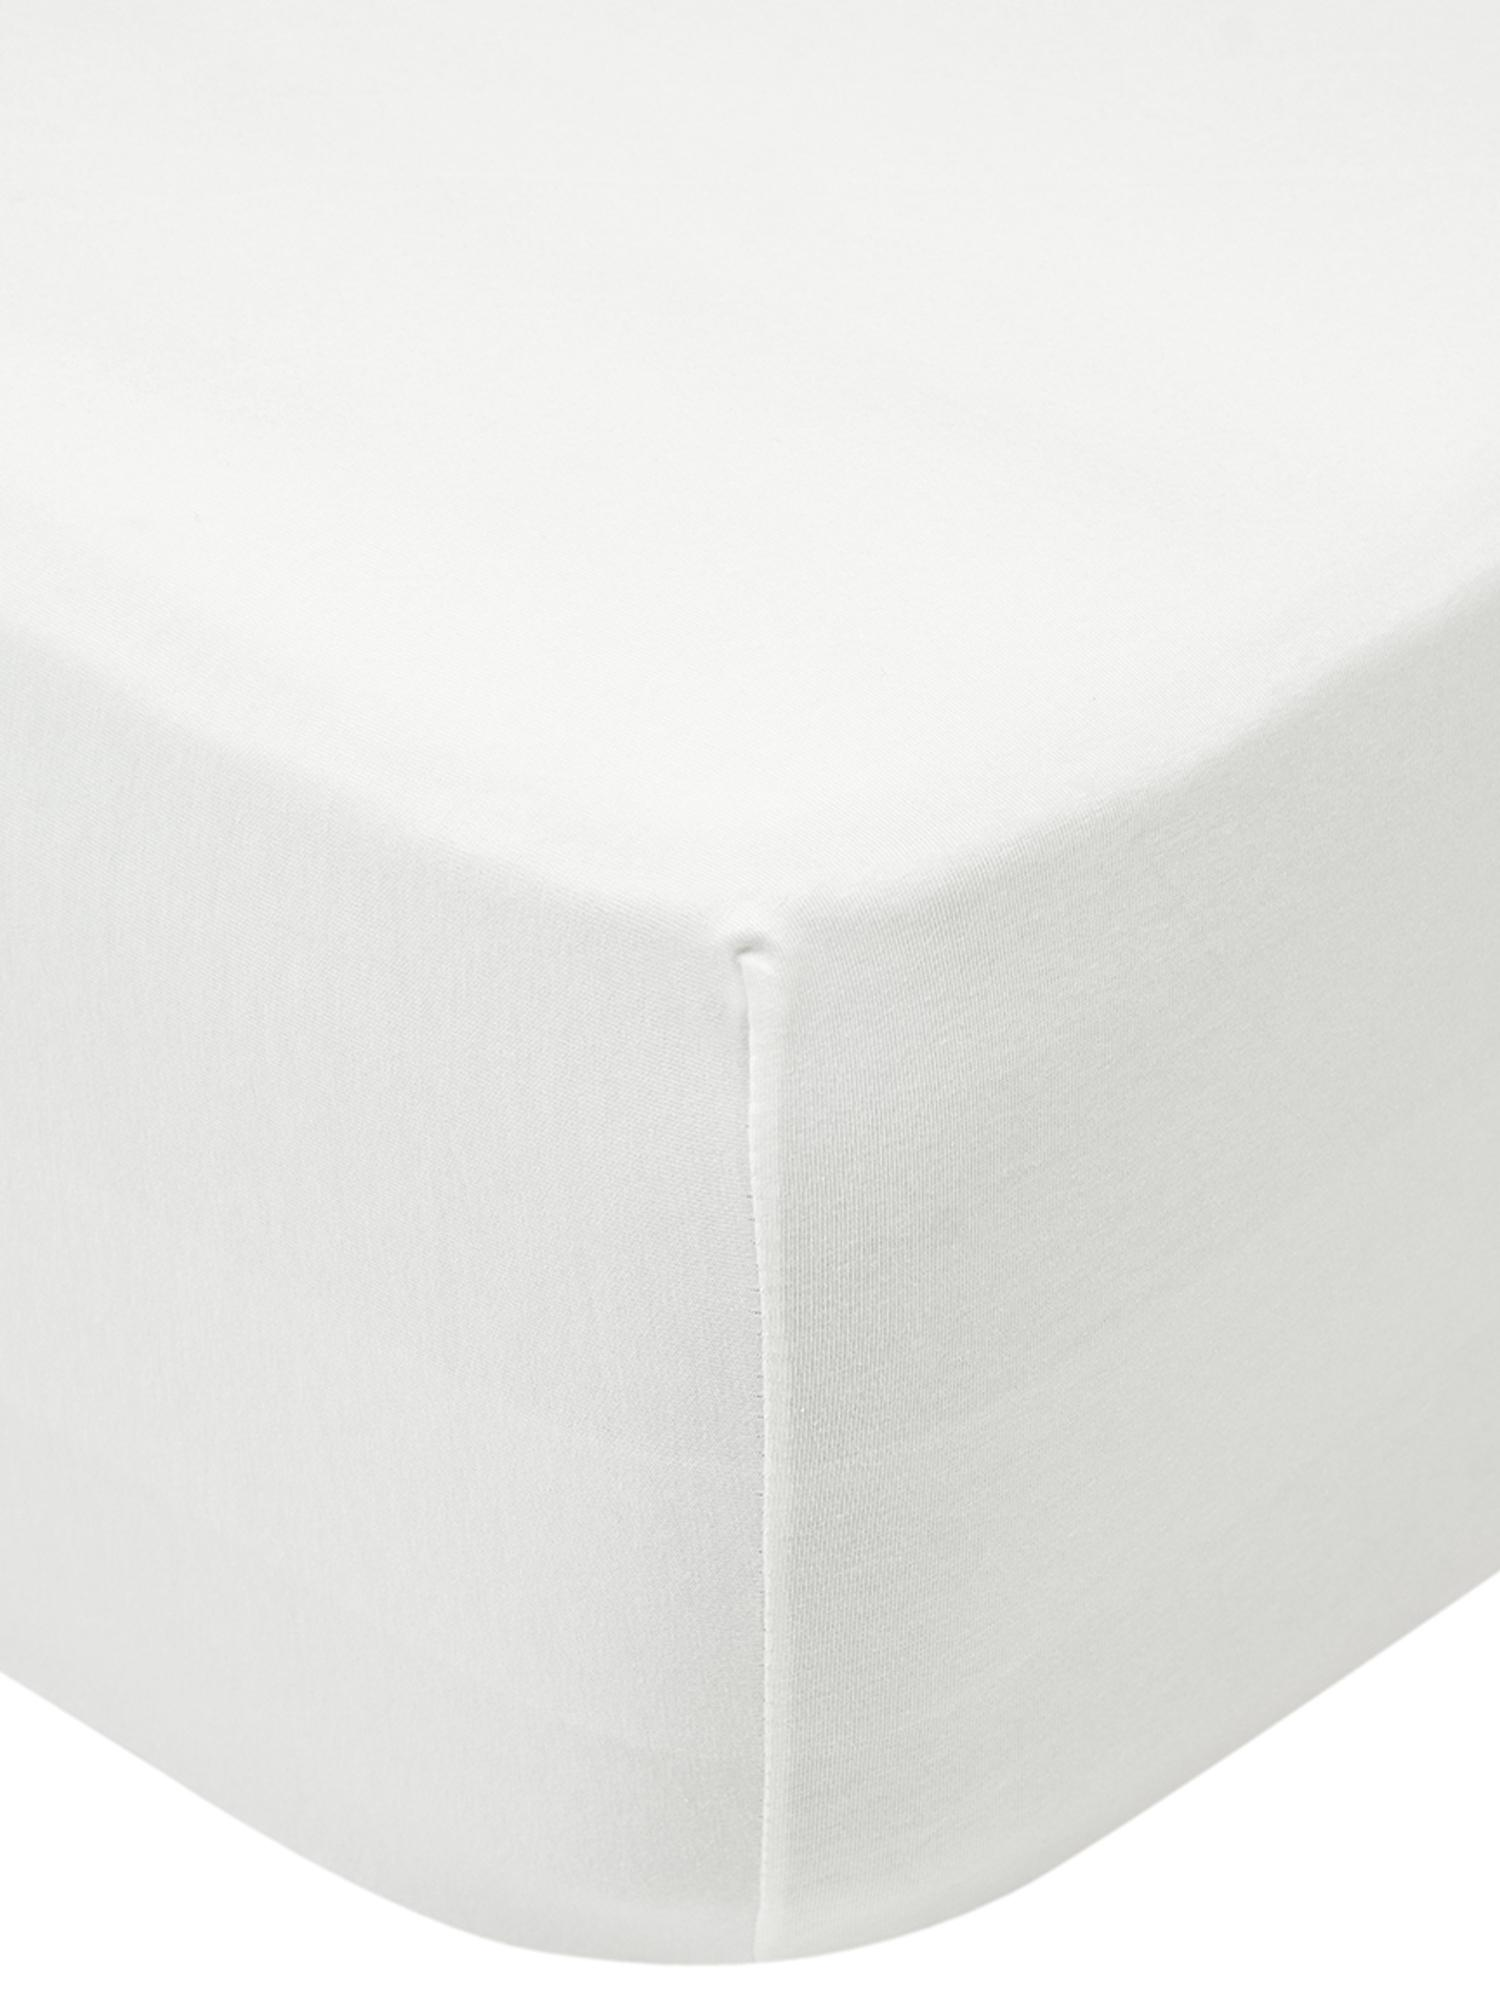 Lenzuolo con angoli  in jersey-elastan Lara, 95% cotone, 5% spandex, Color crema, Larg. 180 x Lung. 200 cm